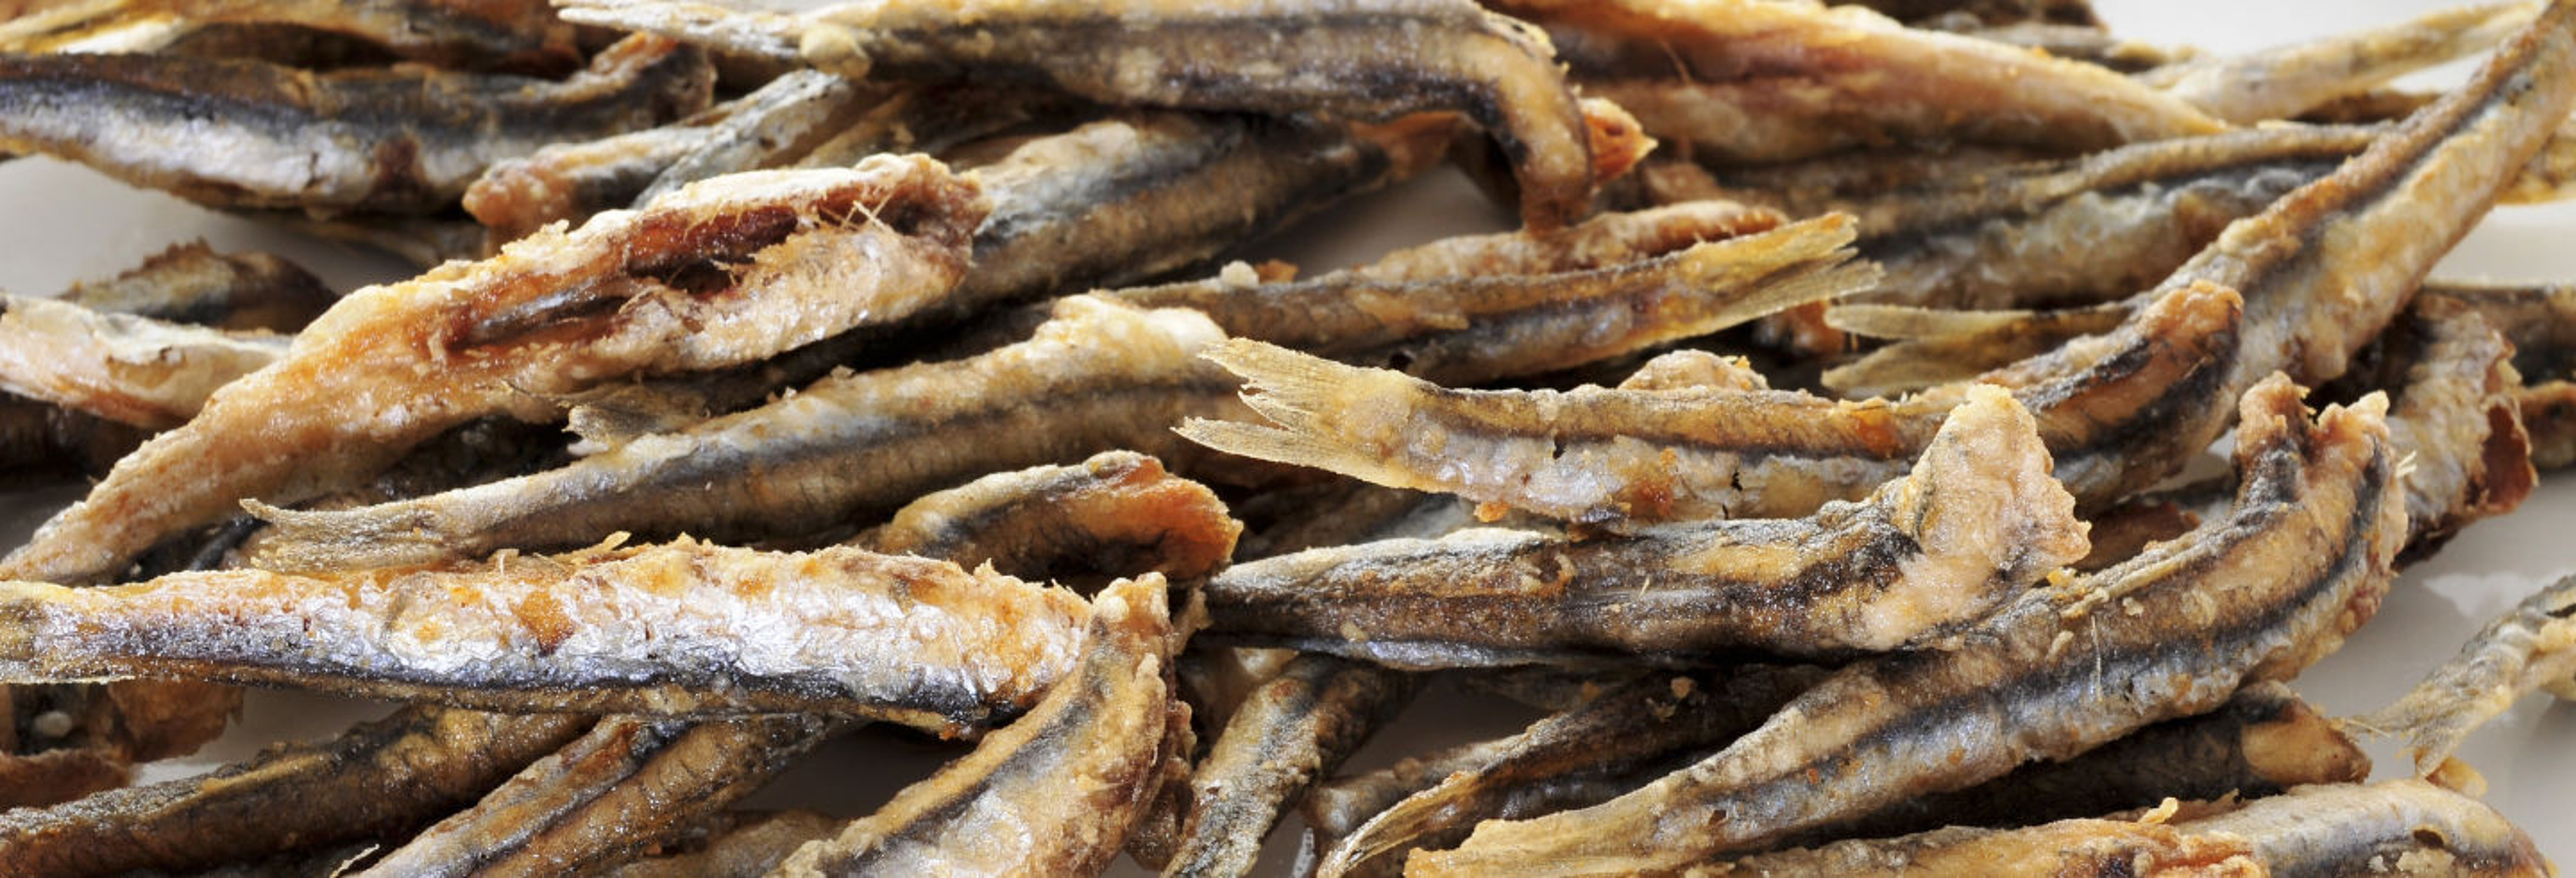 Visite gastronomique de Malaga